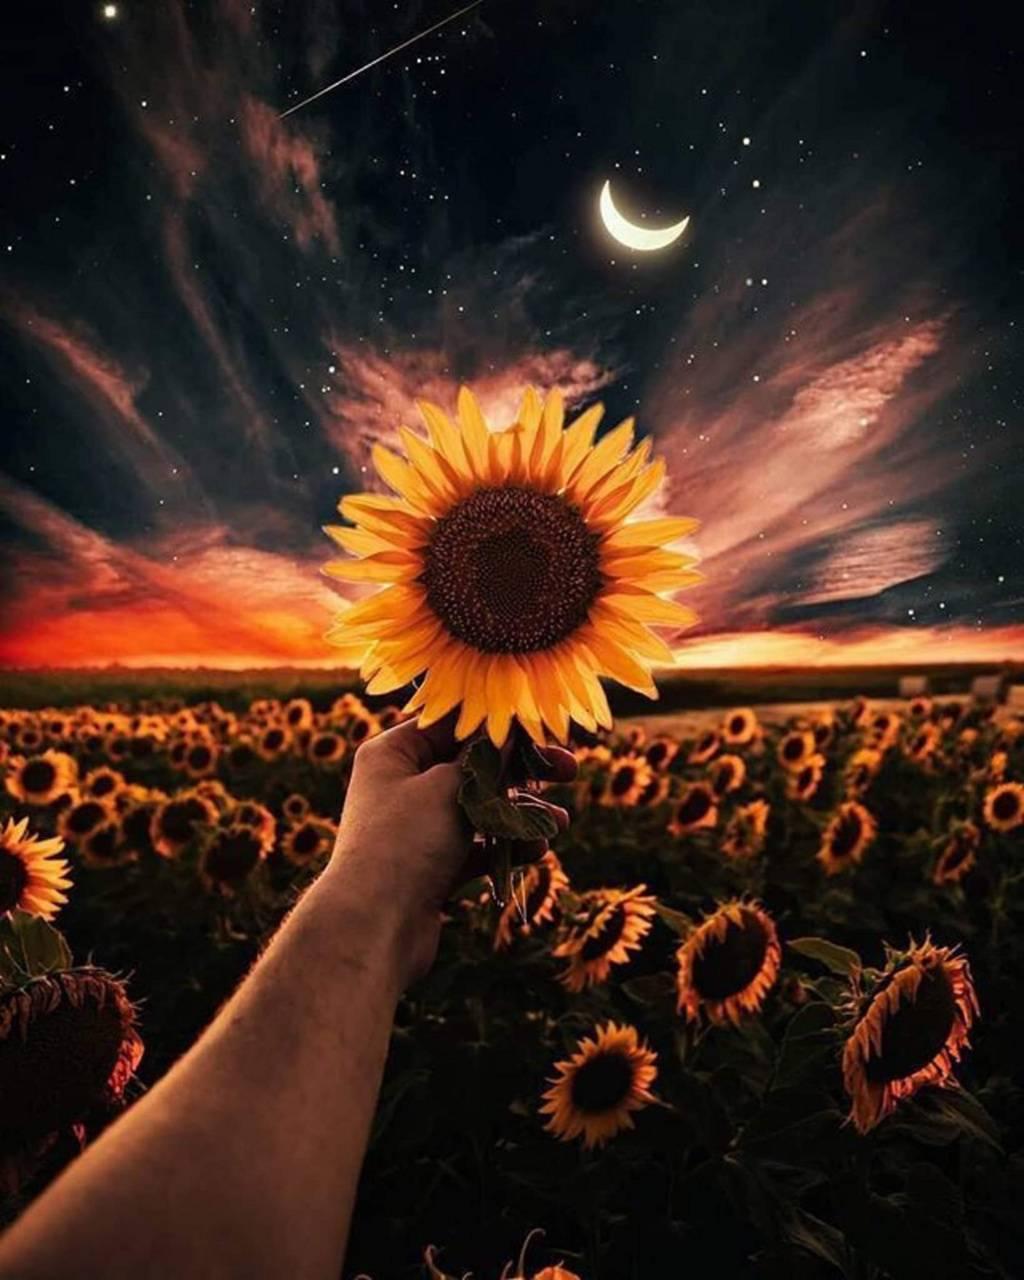 Sunflower wallpaper by geranium19977001 - d3 - Free on ZEDGE™